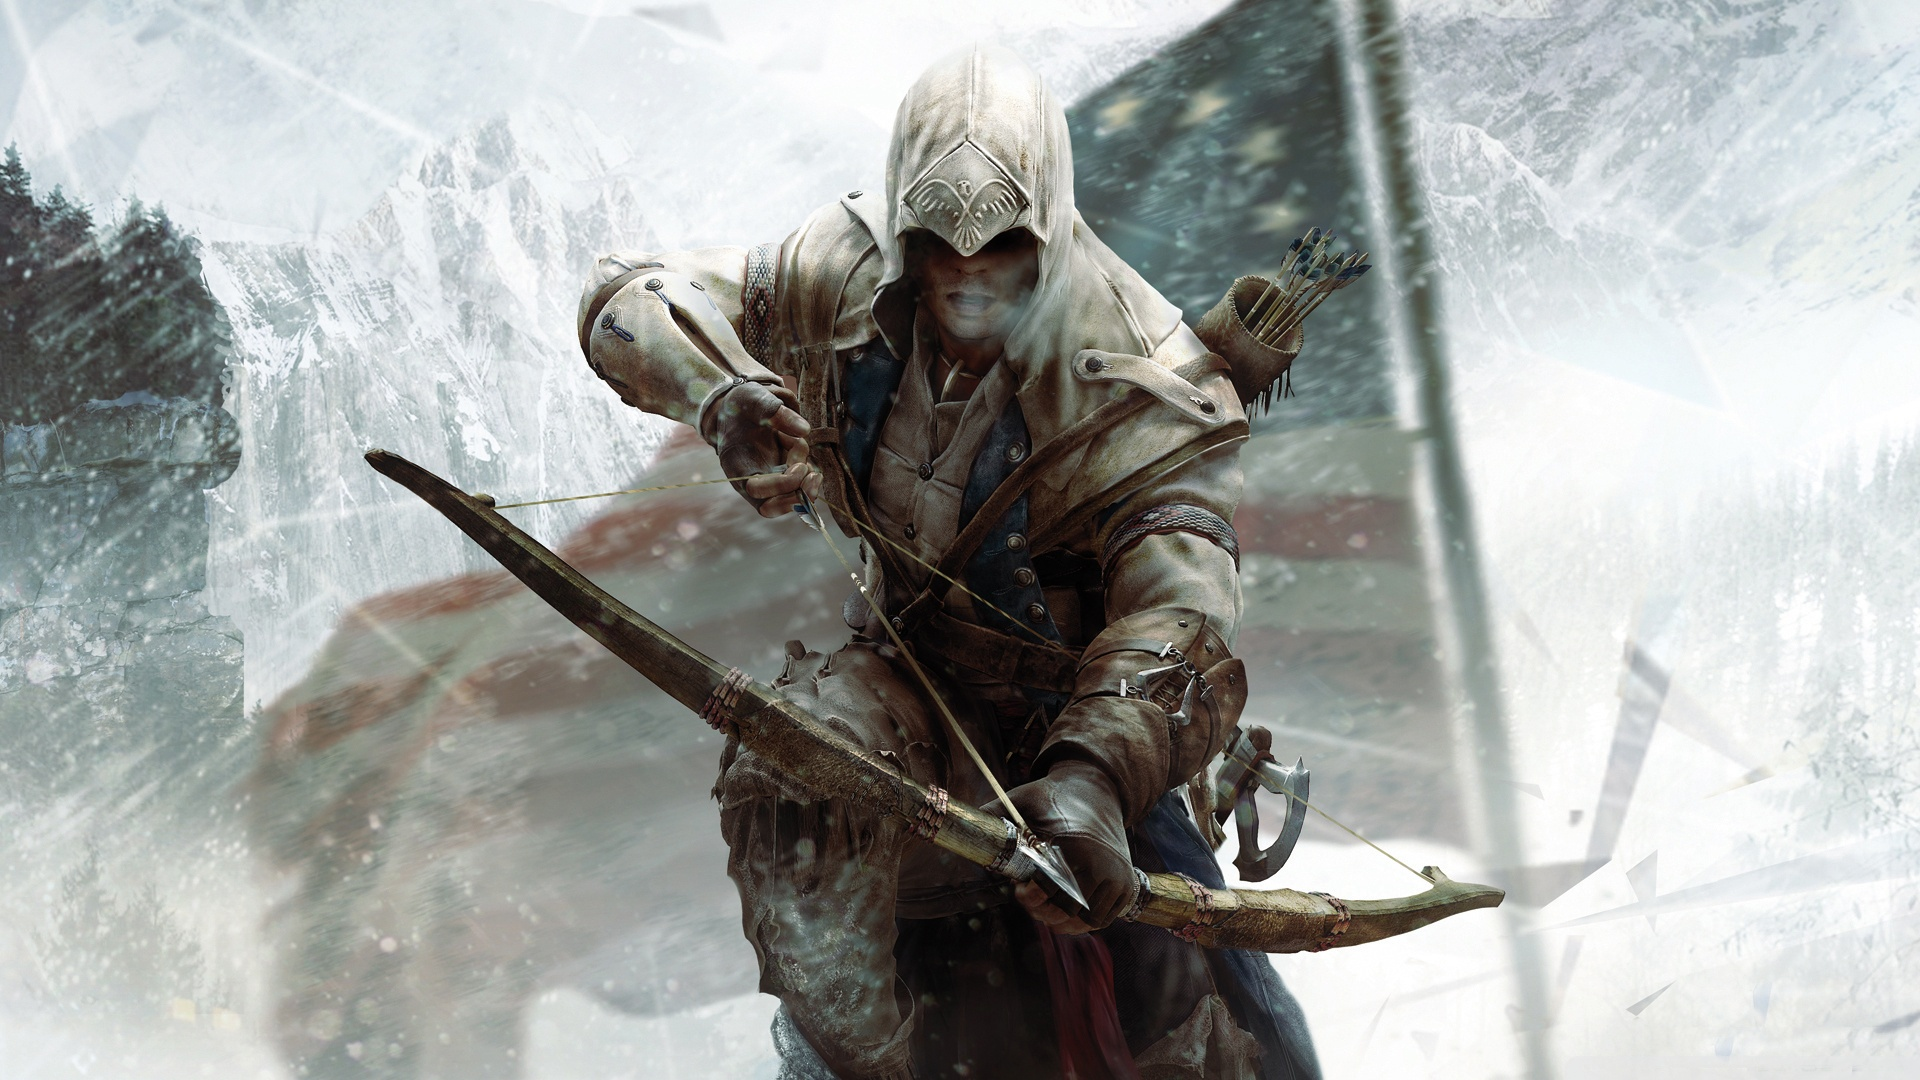 Konu AssassinS Creed III Wallpapers 1920x1080